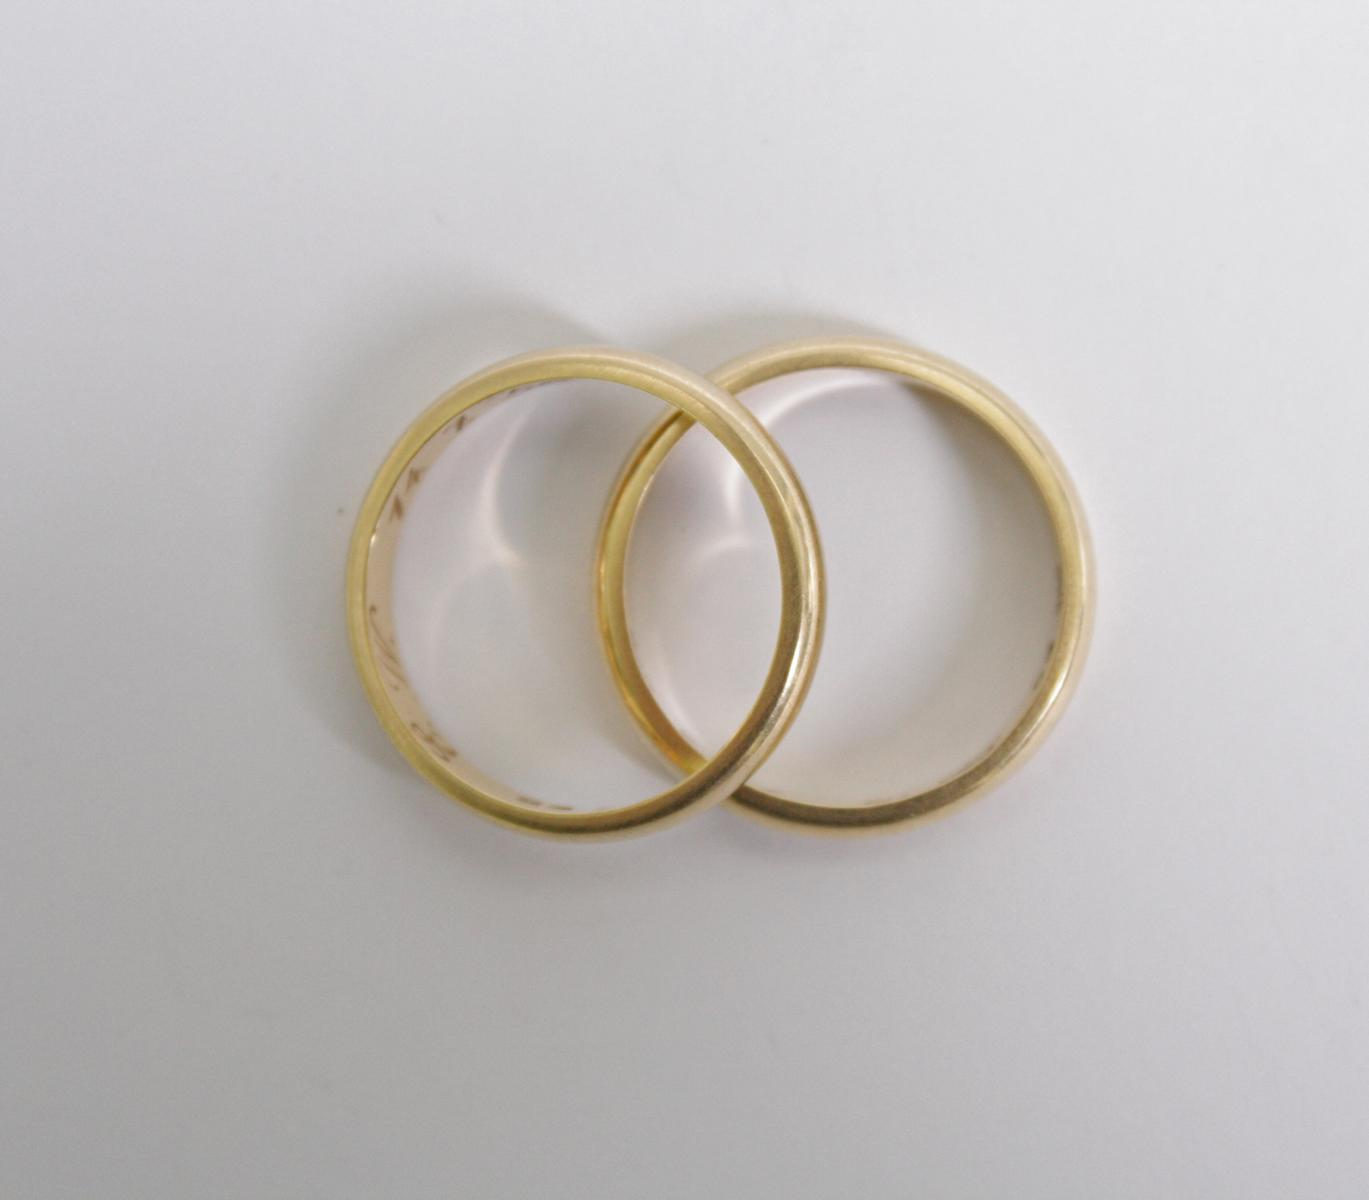 Paar Eheringe, 14 Karat Gelbgold